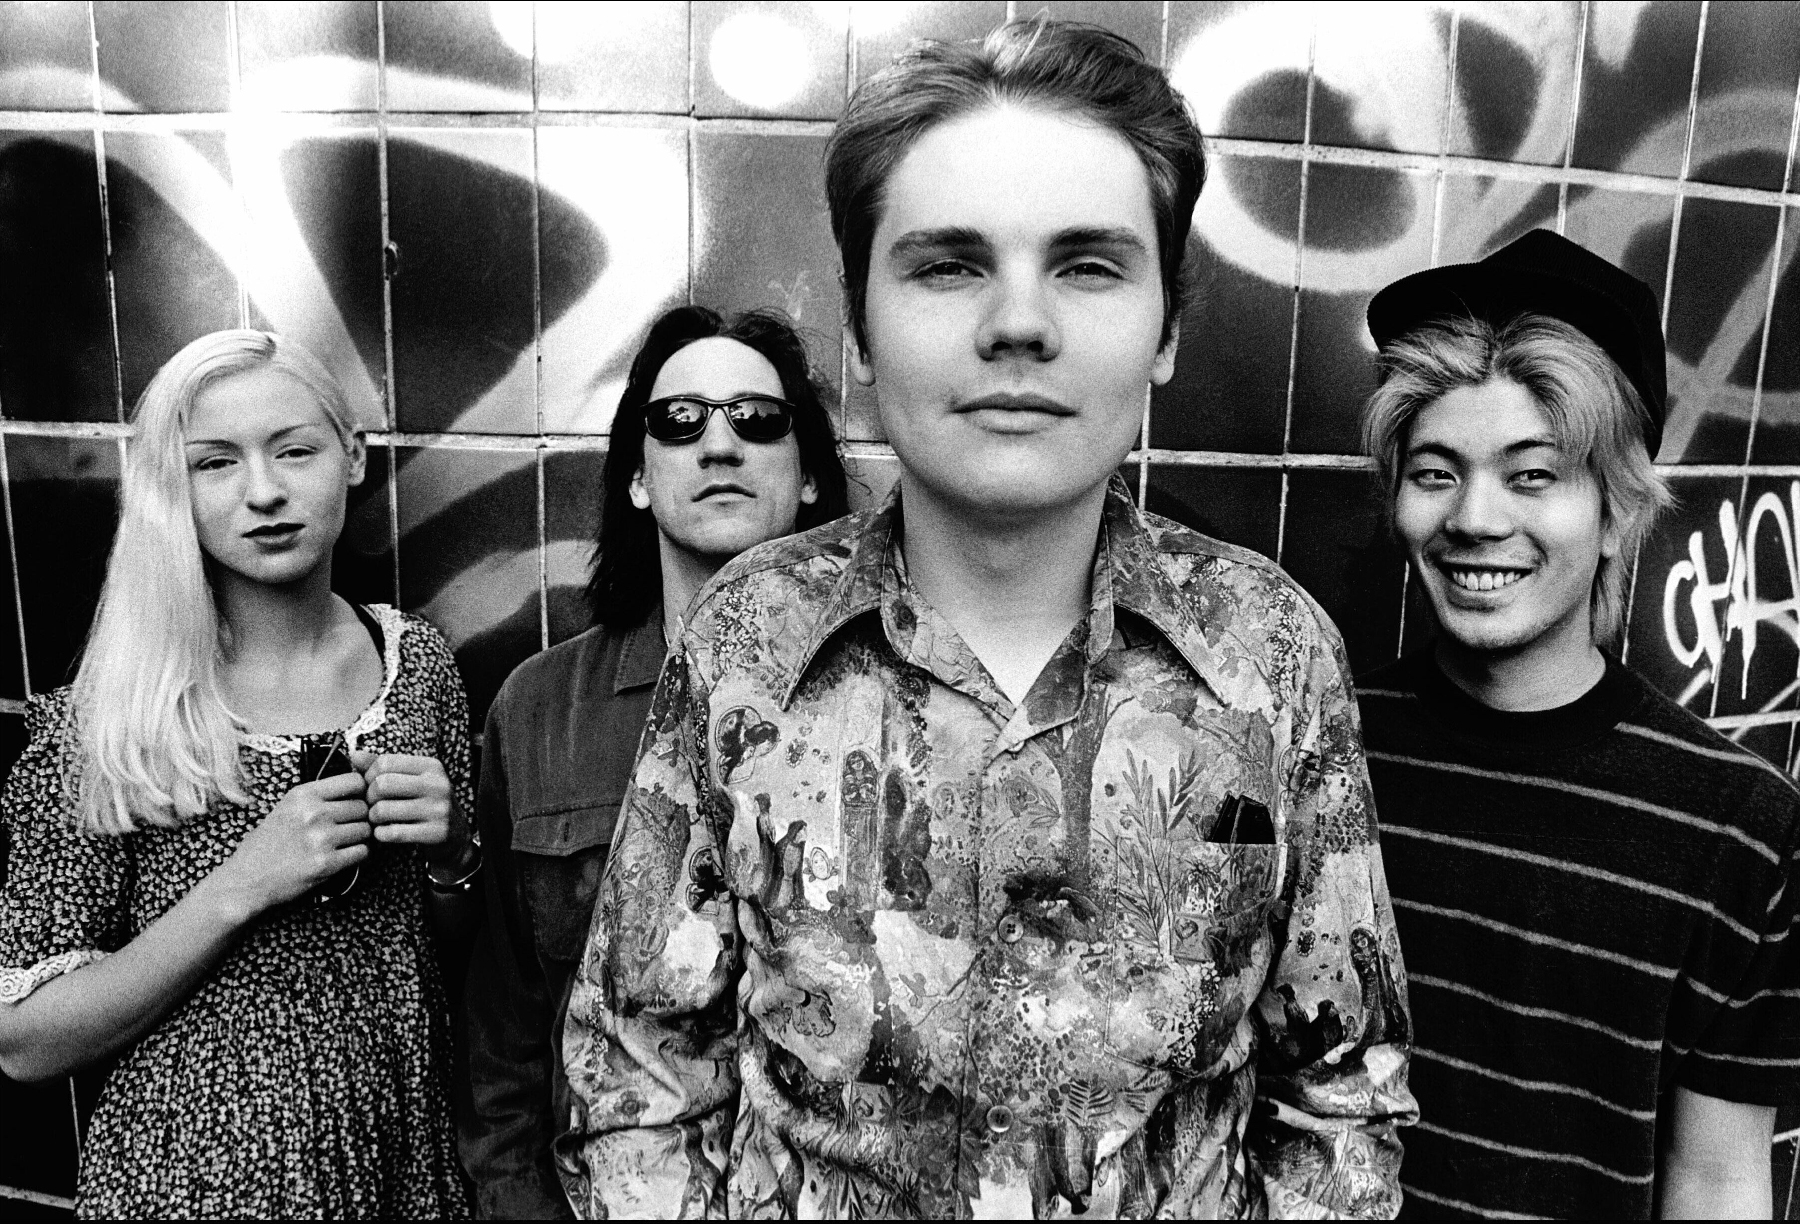 An image of the rock band The Smashing Pumpkins taken in 1993.